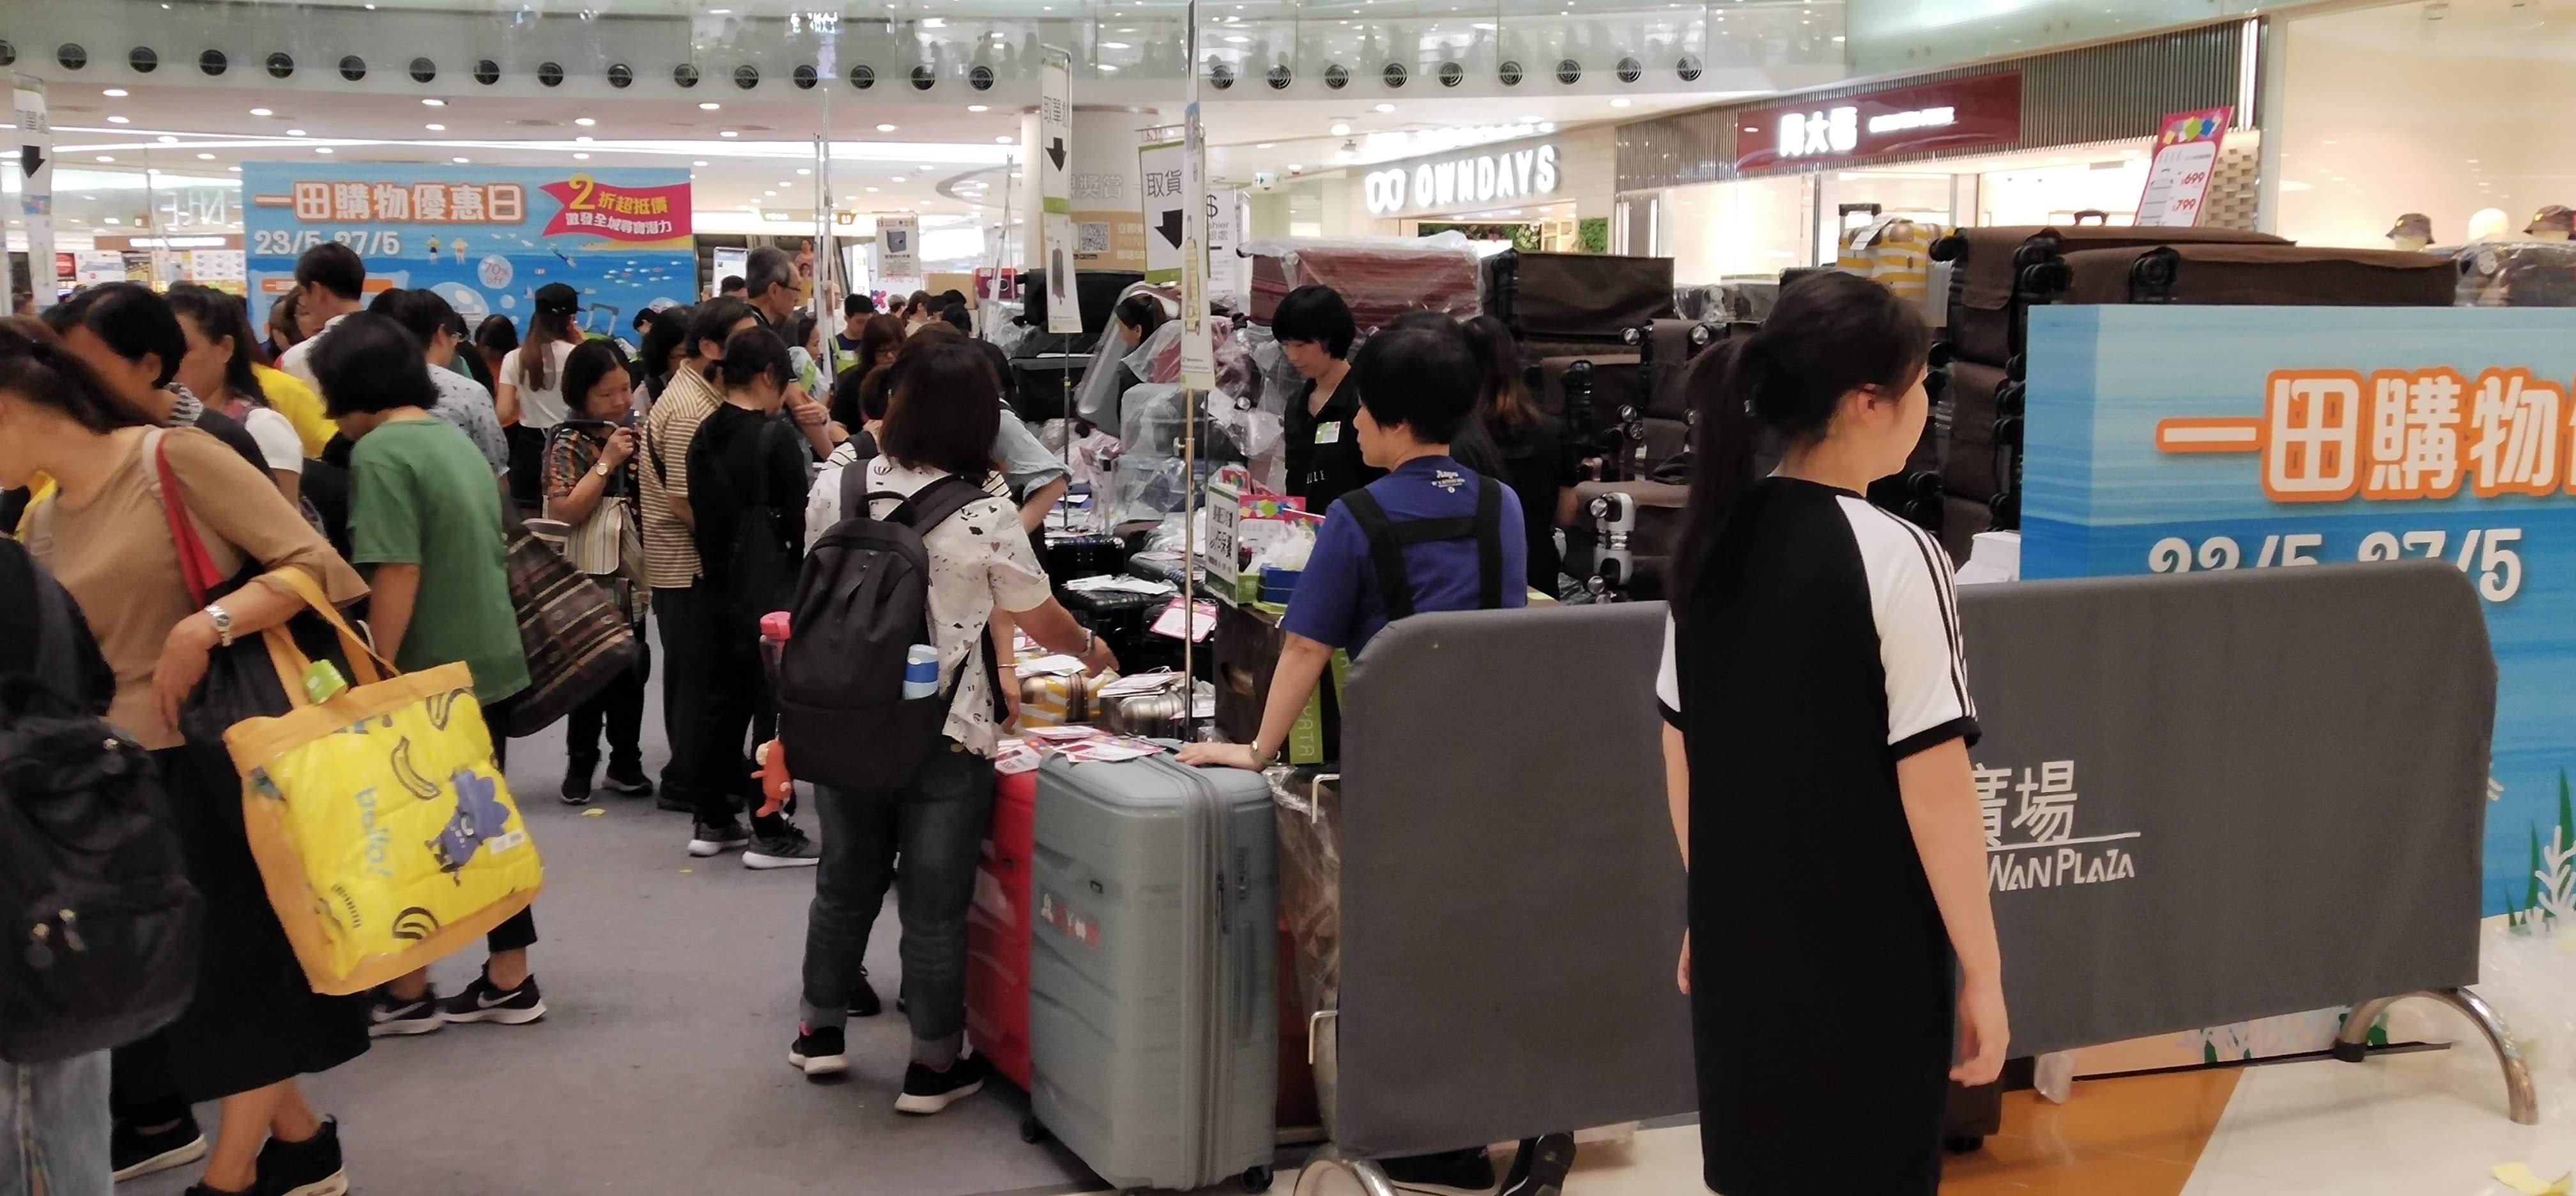 Crowds buying suitcase